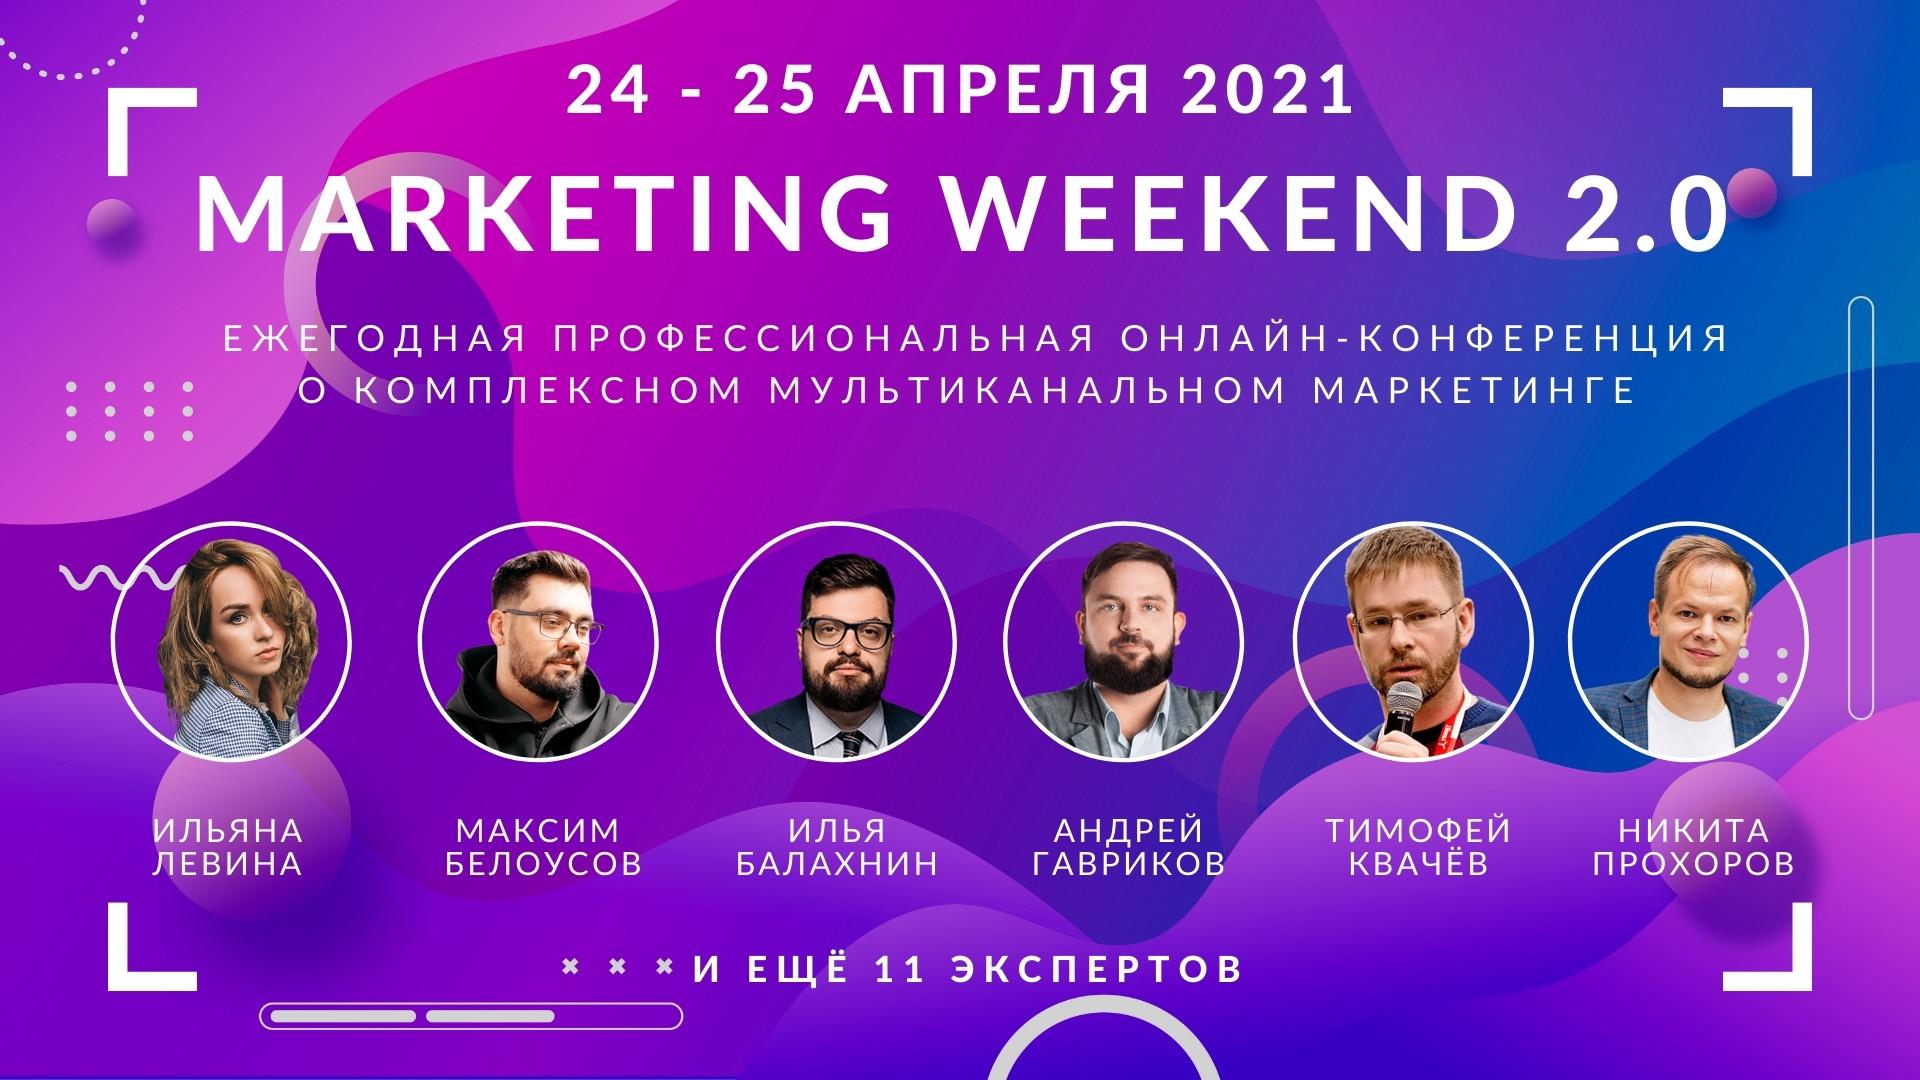 Marketing Weekend 2.0